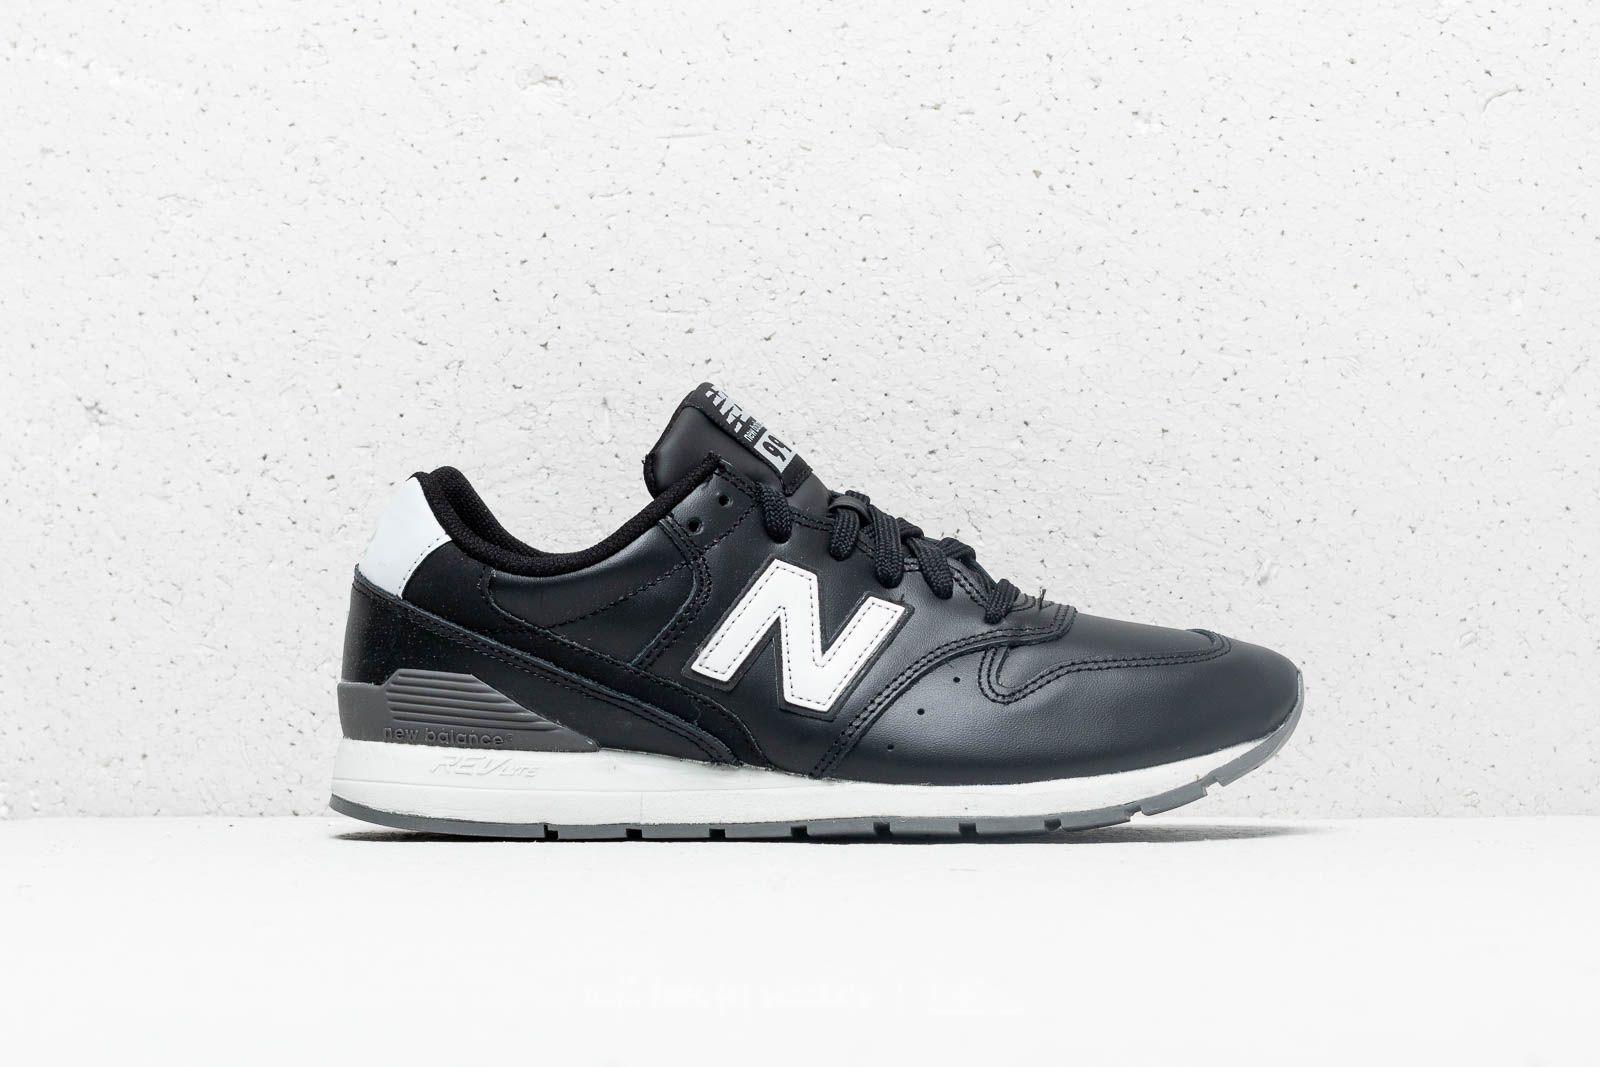 new balance 996 black and white